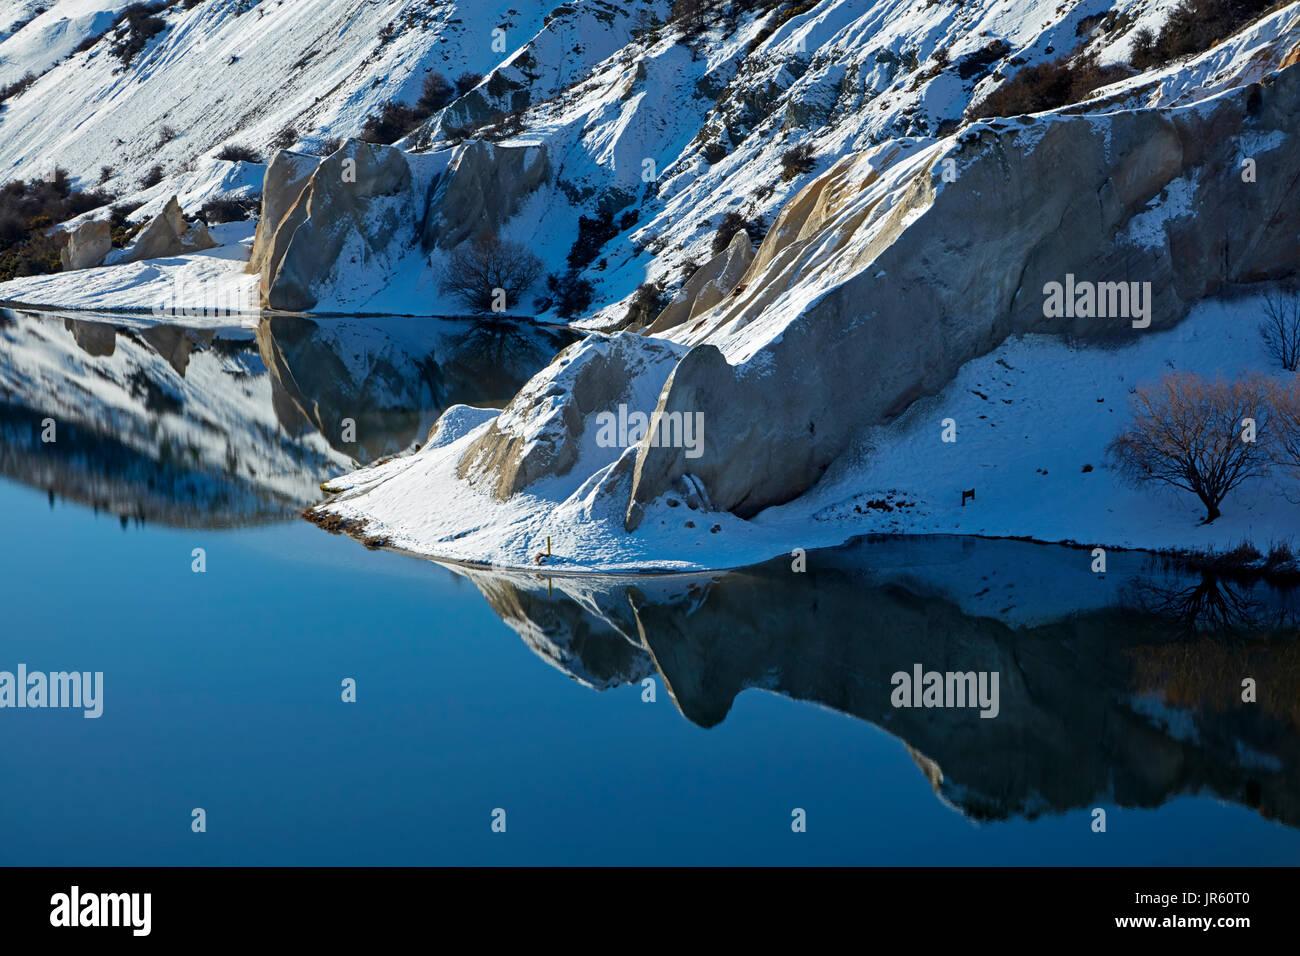 Schnee um blaue See, St. Bathan, Maniototo, Central Otago, Südinsel, Neuseeland Stockbild